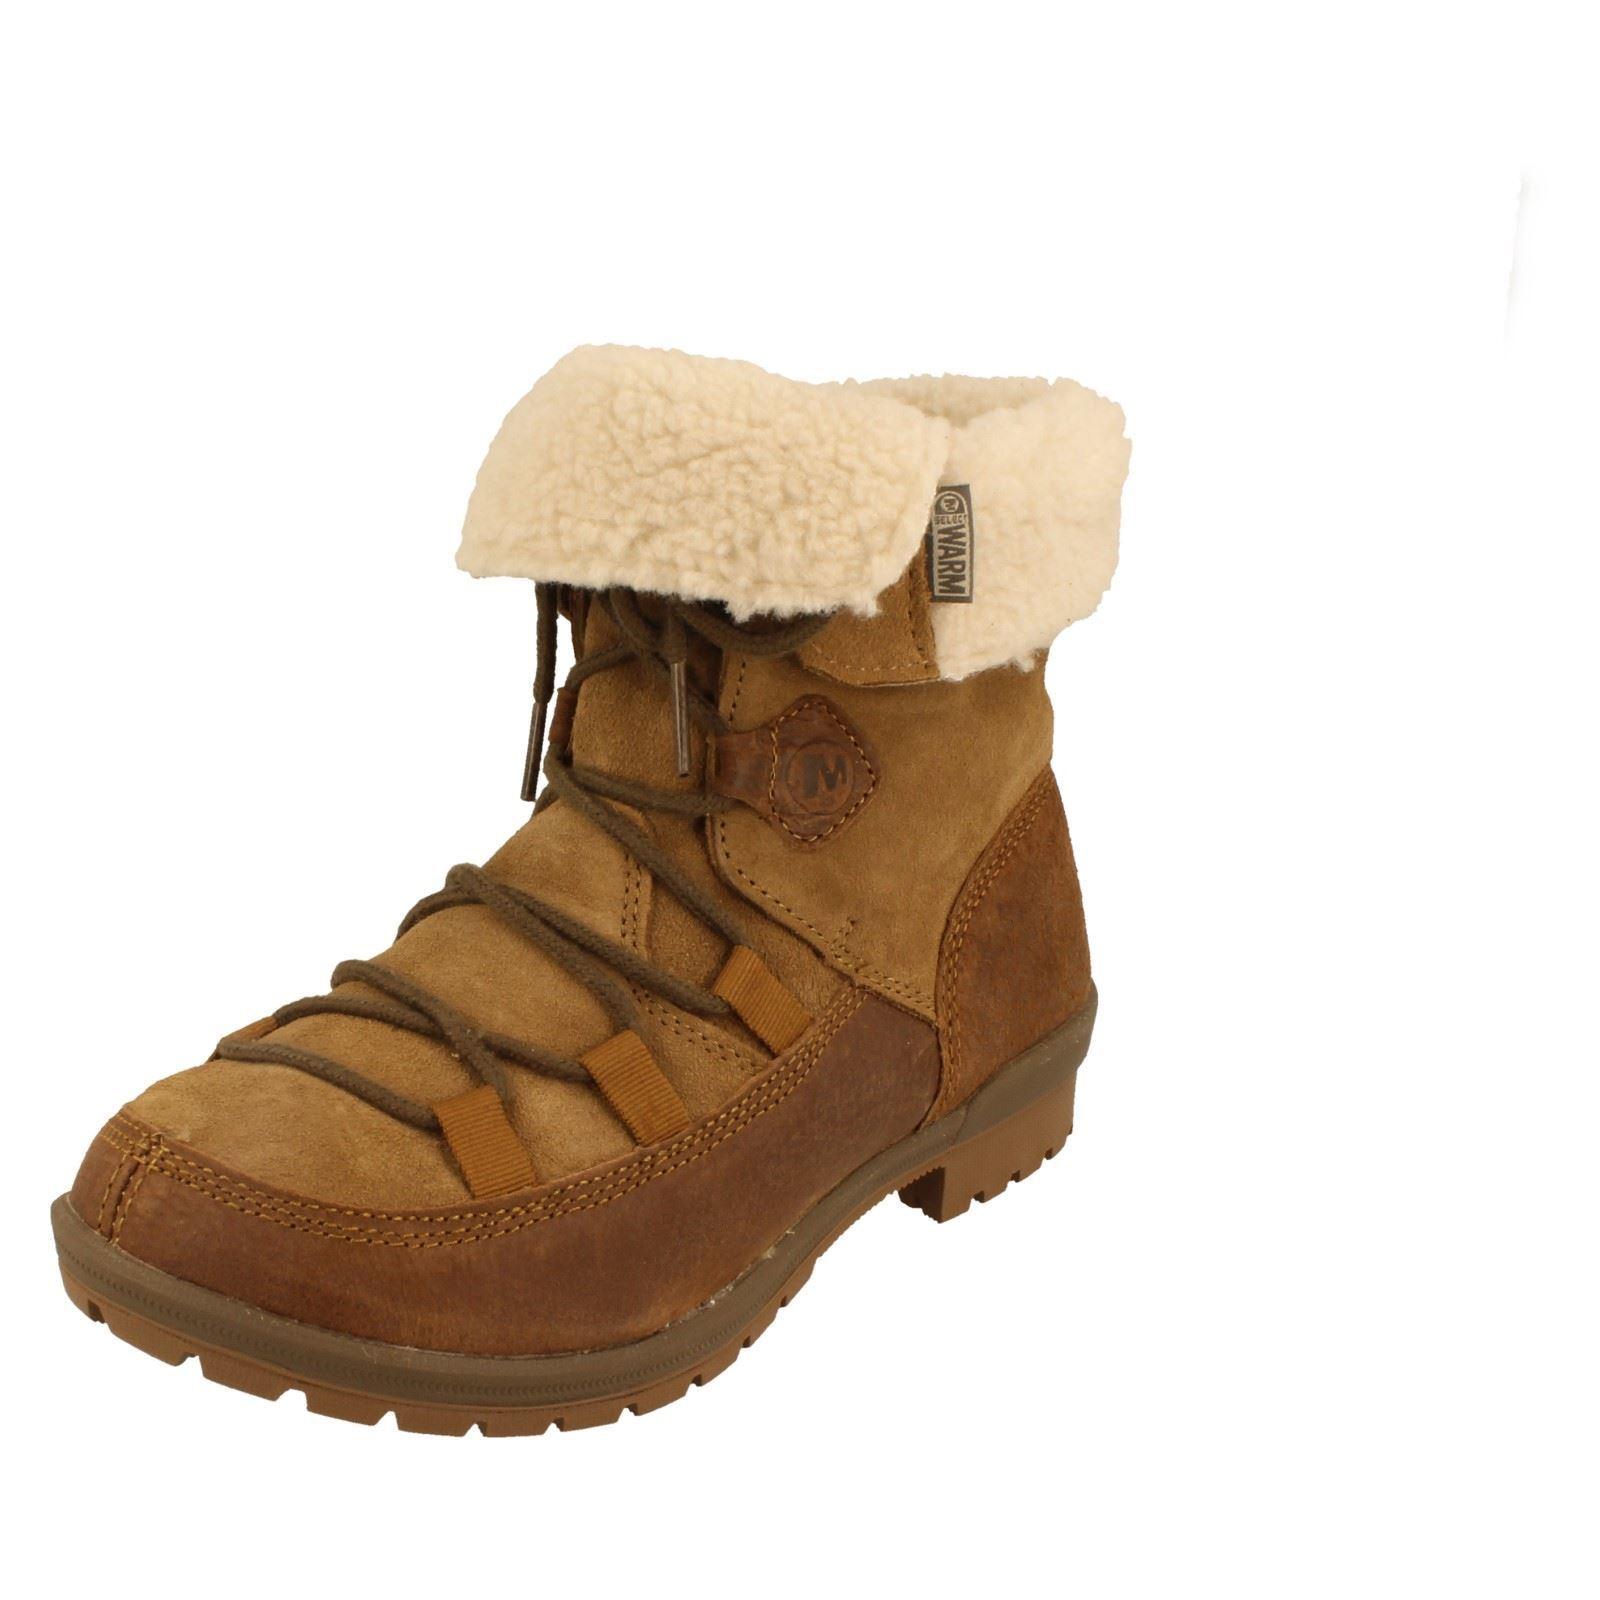 Señoras Esmeril Encaje marrón Multi Cuero botín por Merrell .00